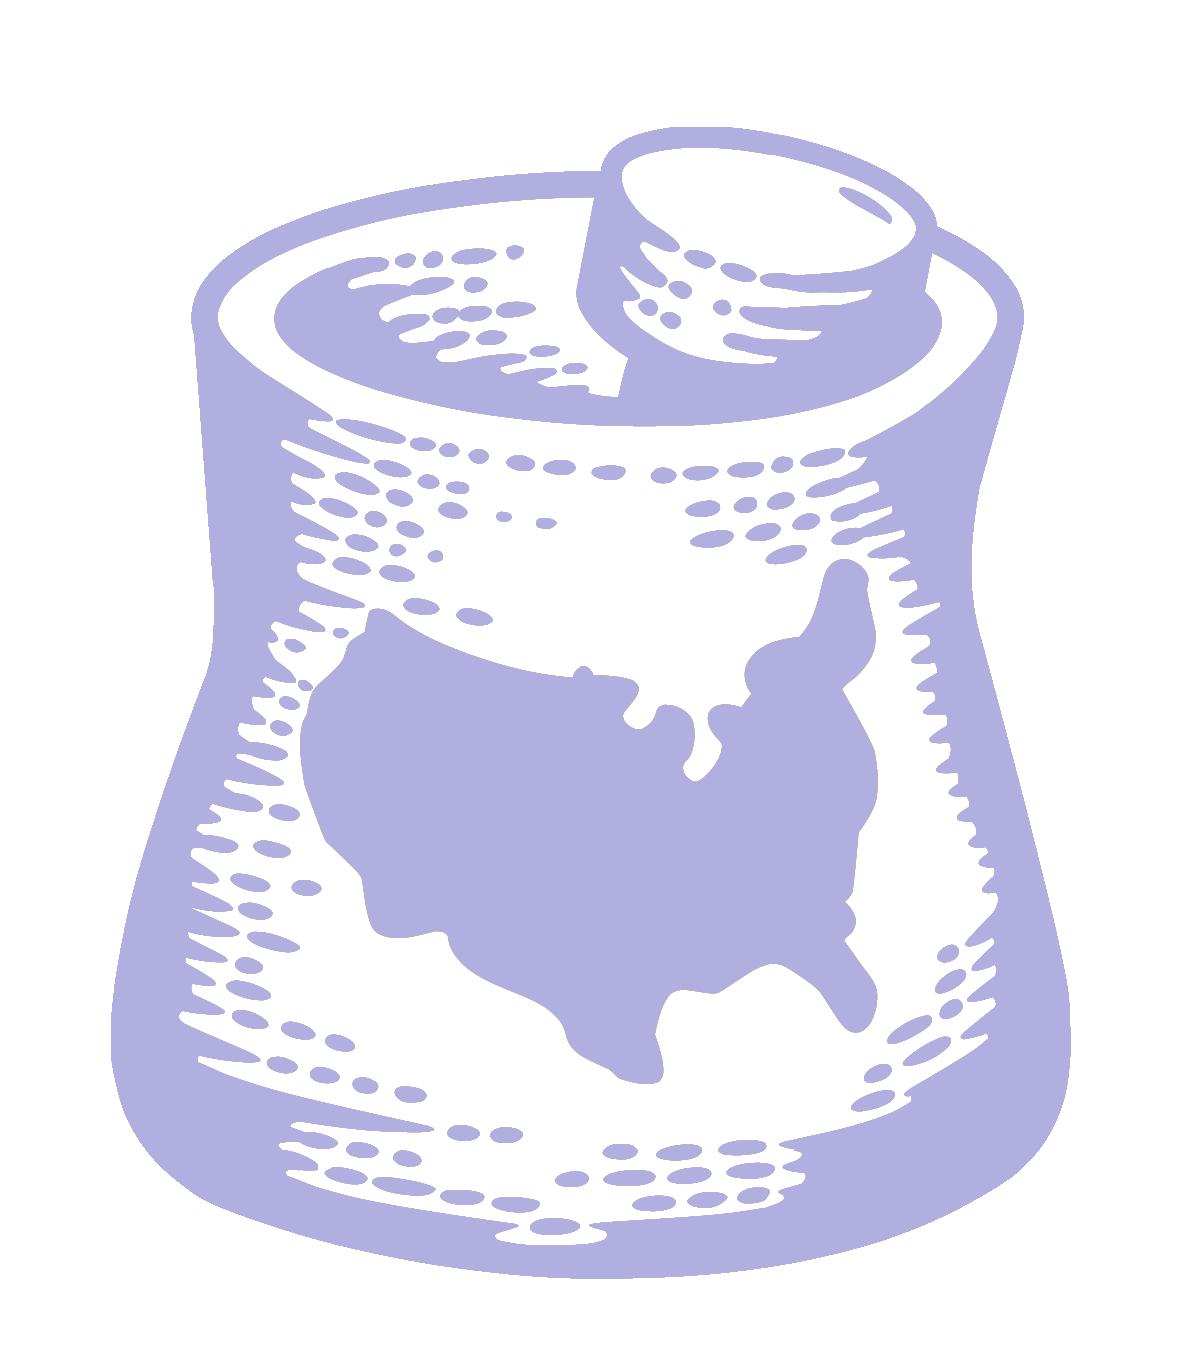 Nation's Bowl